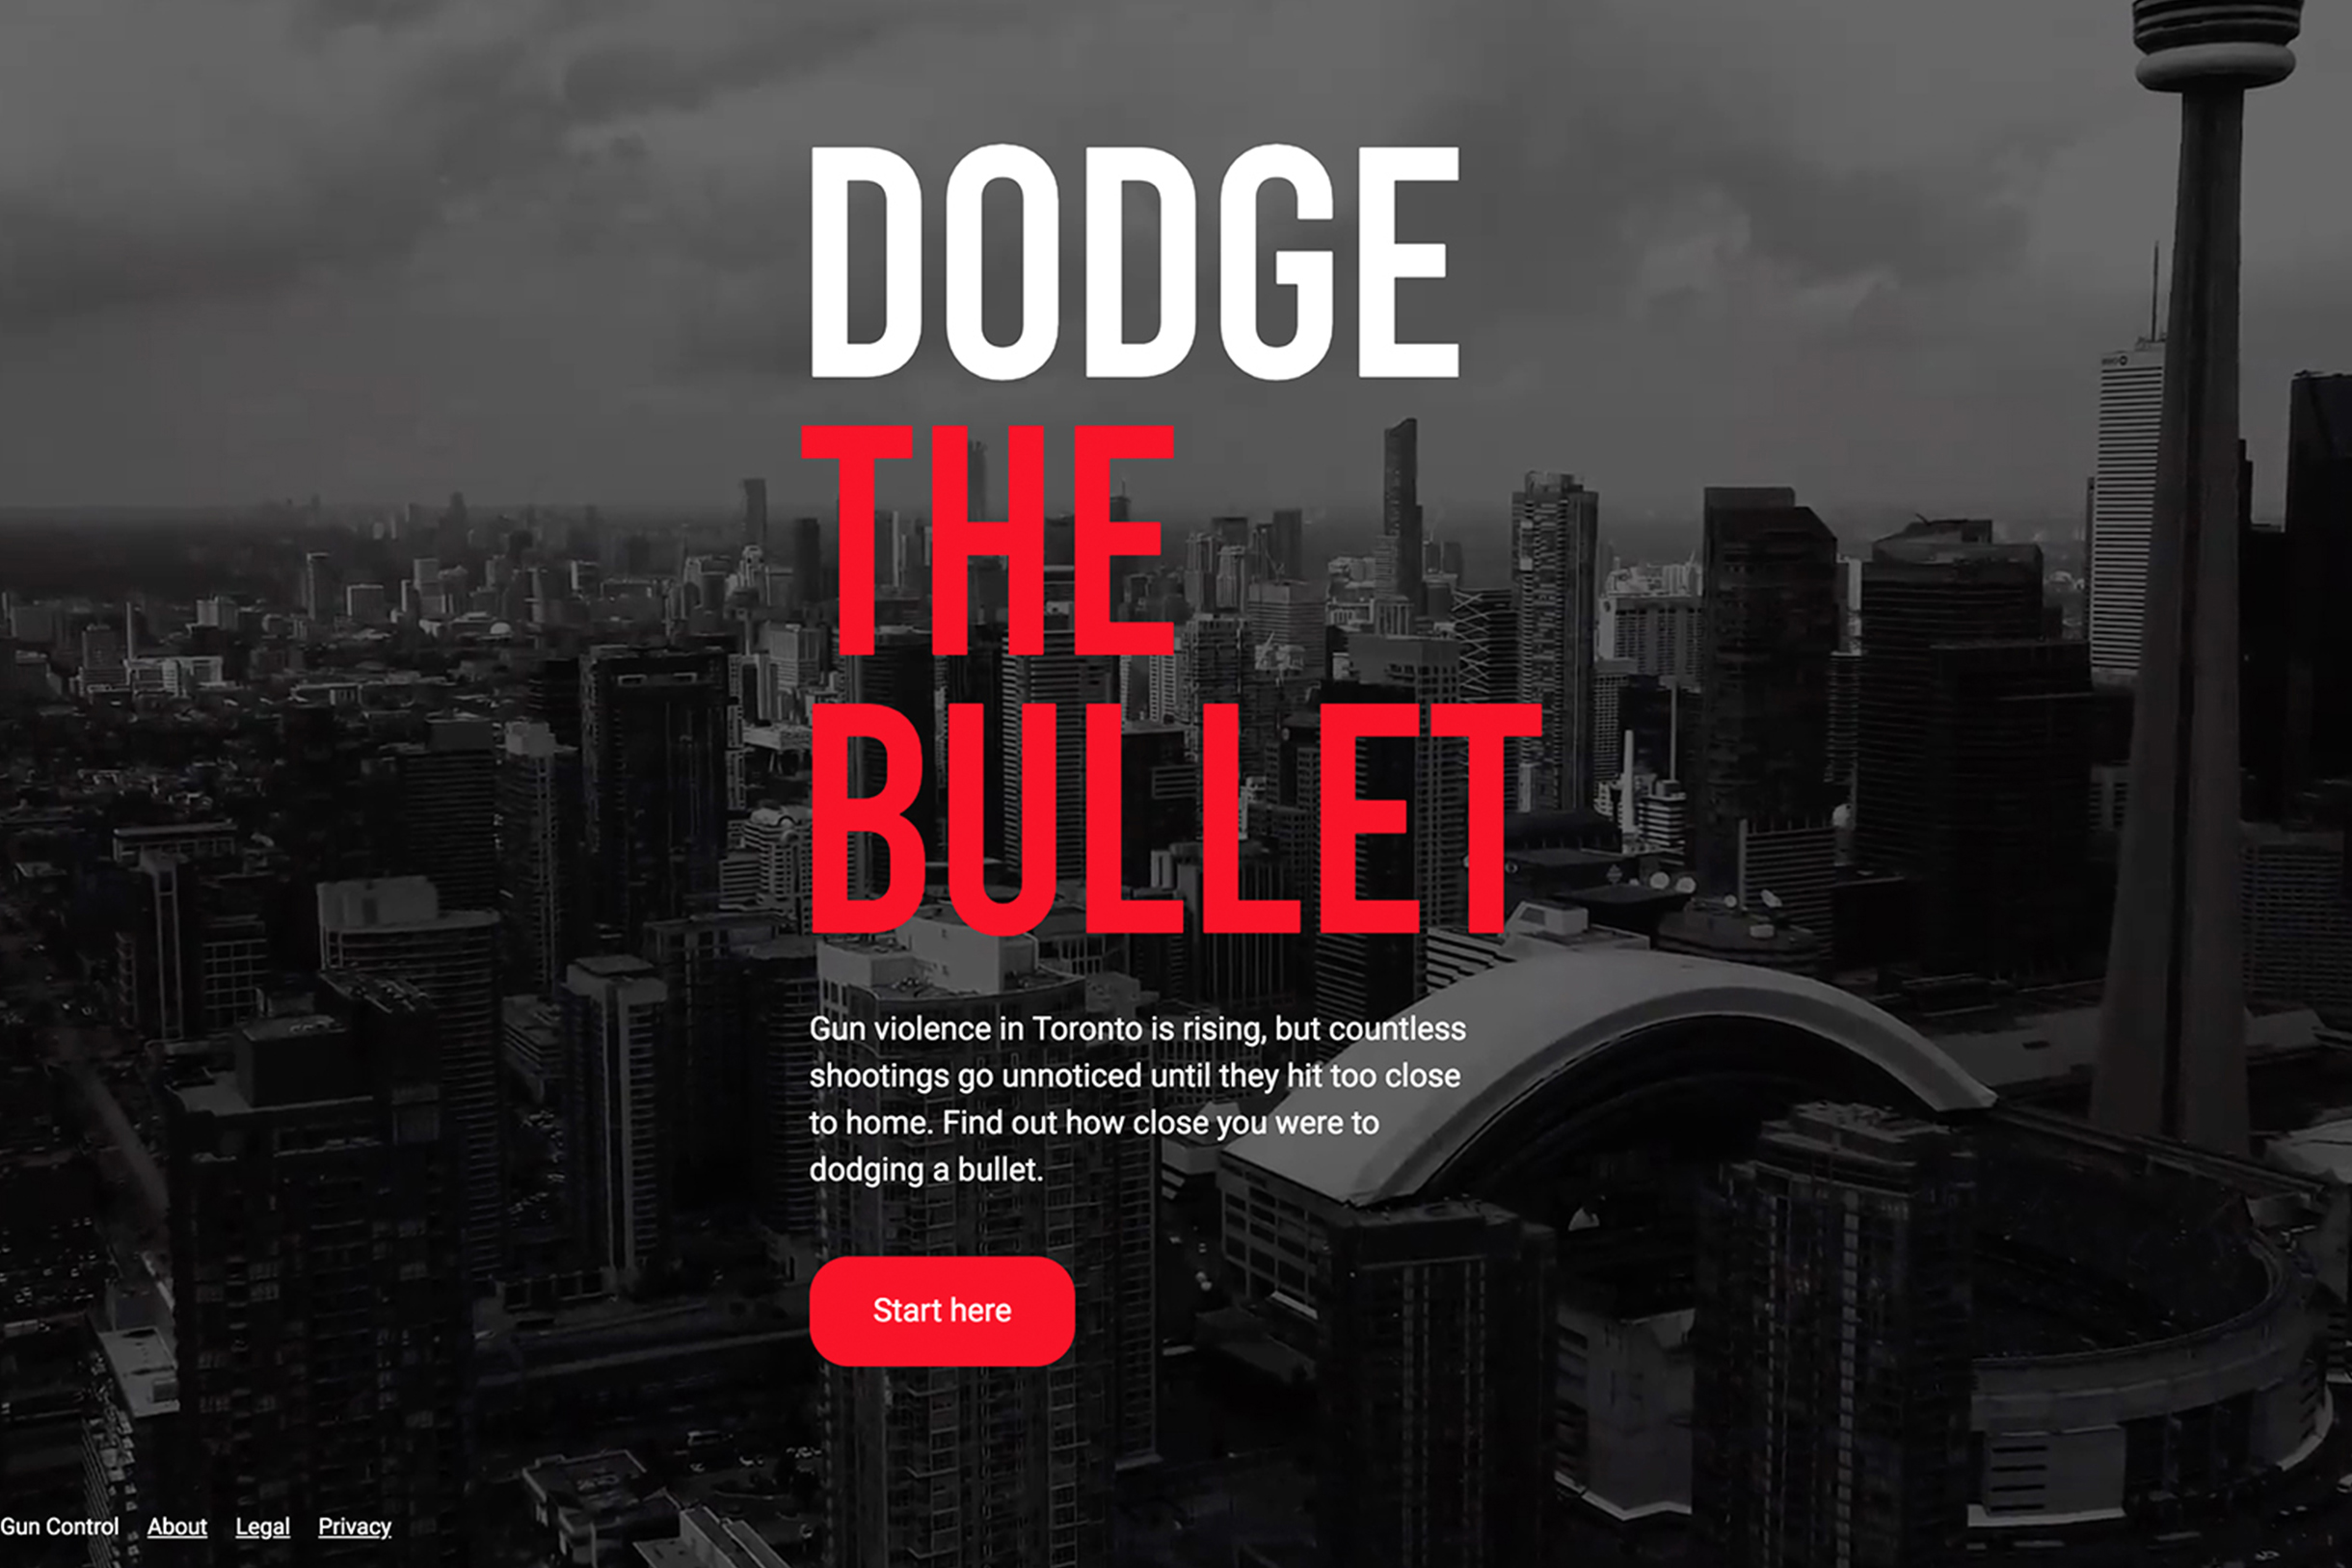 Dodge the Bullet